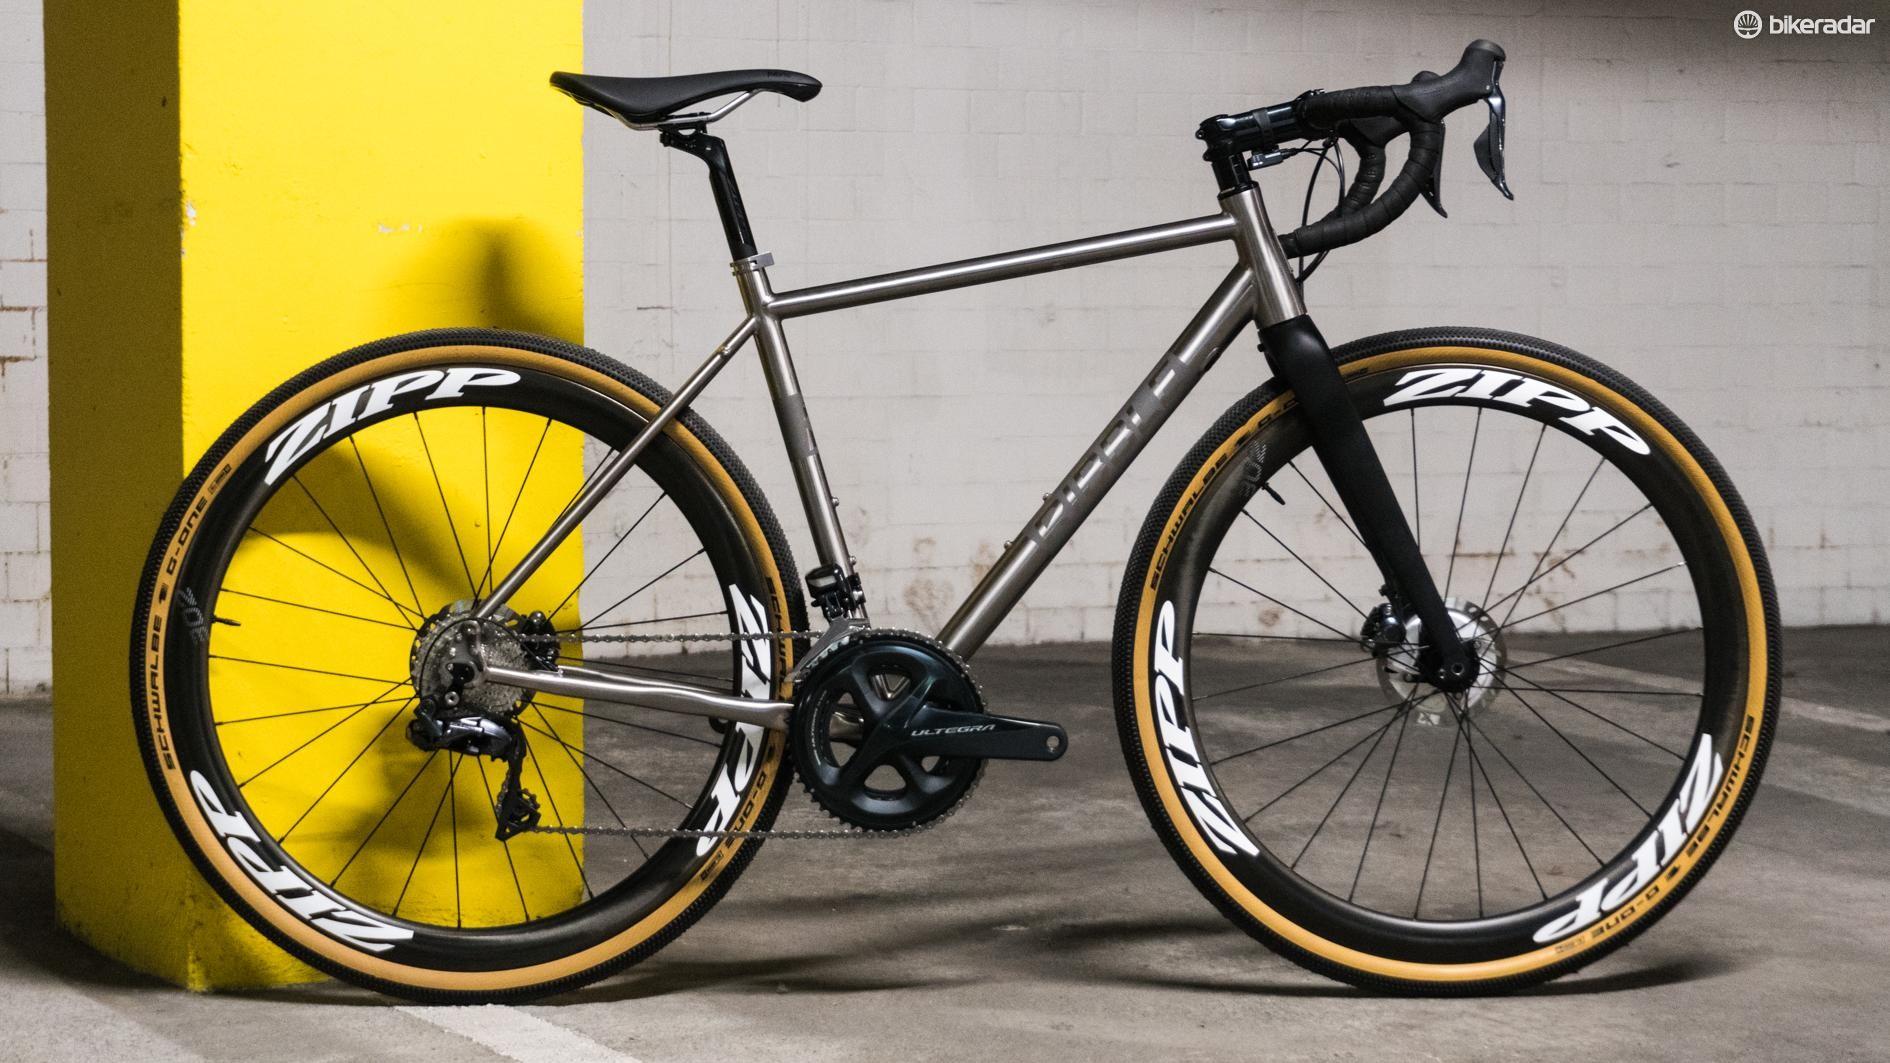 The bike cuts a handsome silhouette